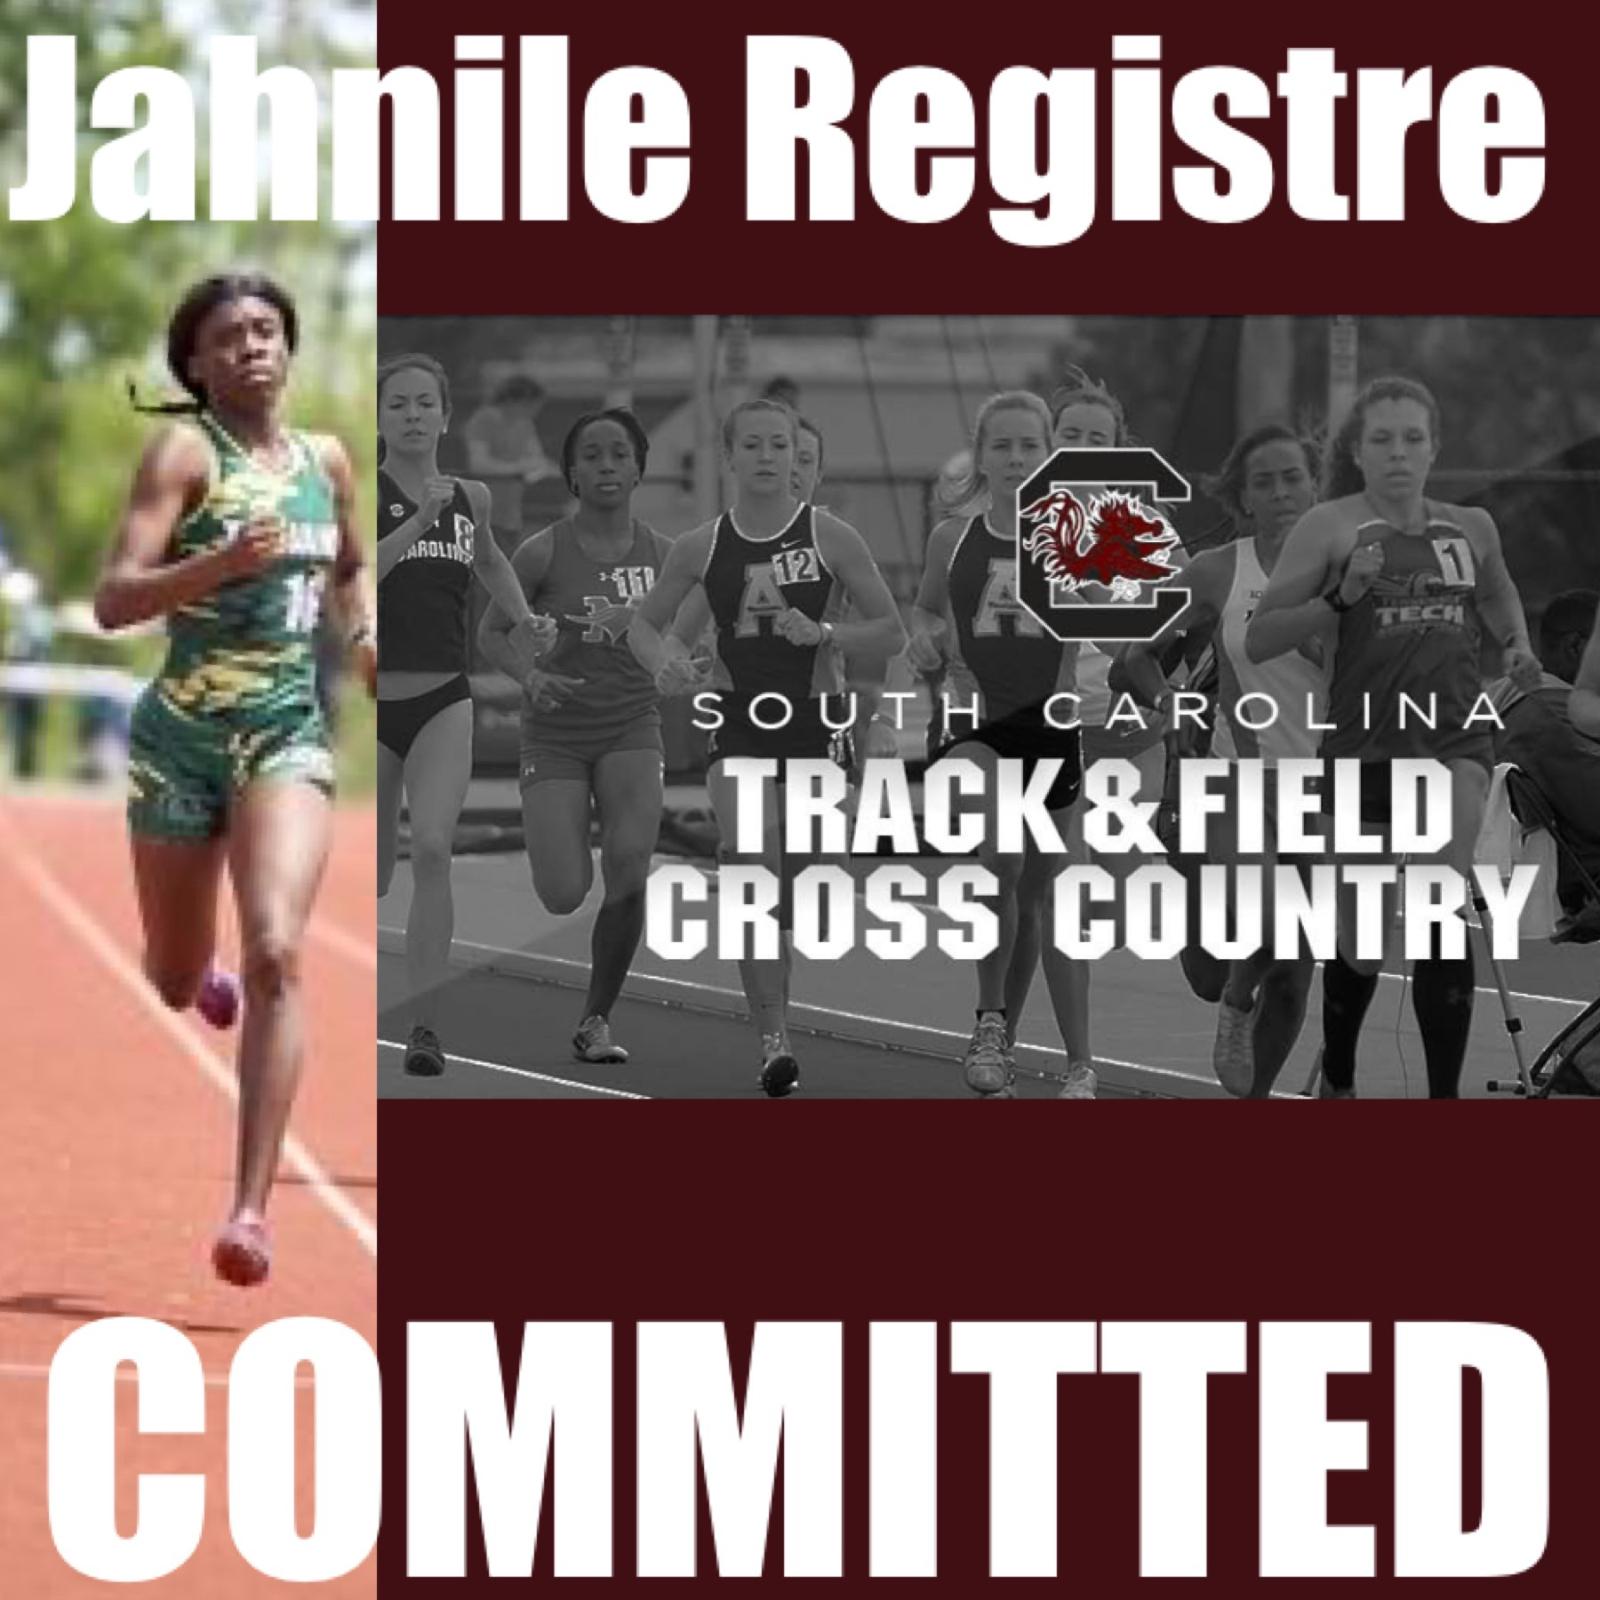 Jahnile Registre Commits to South Carolina